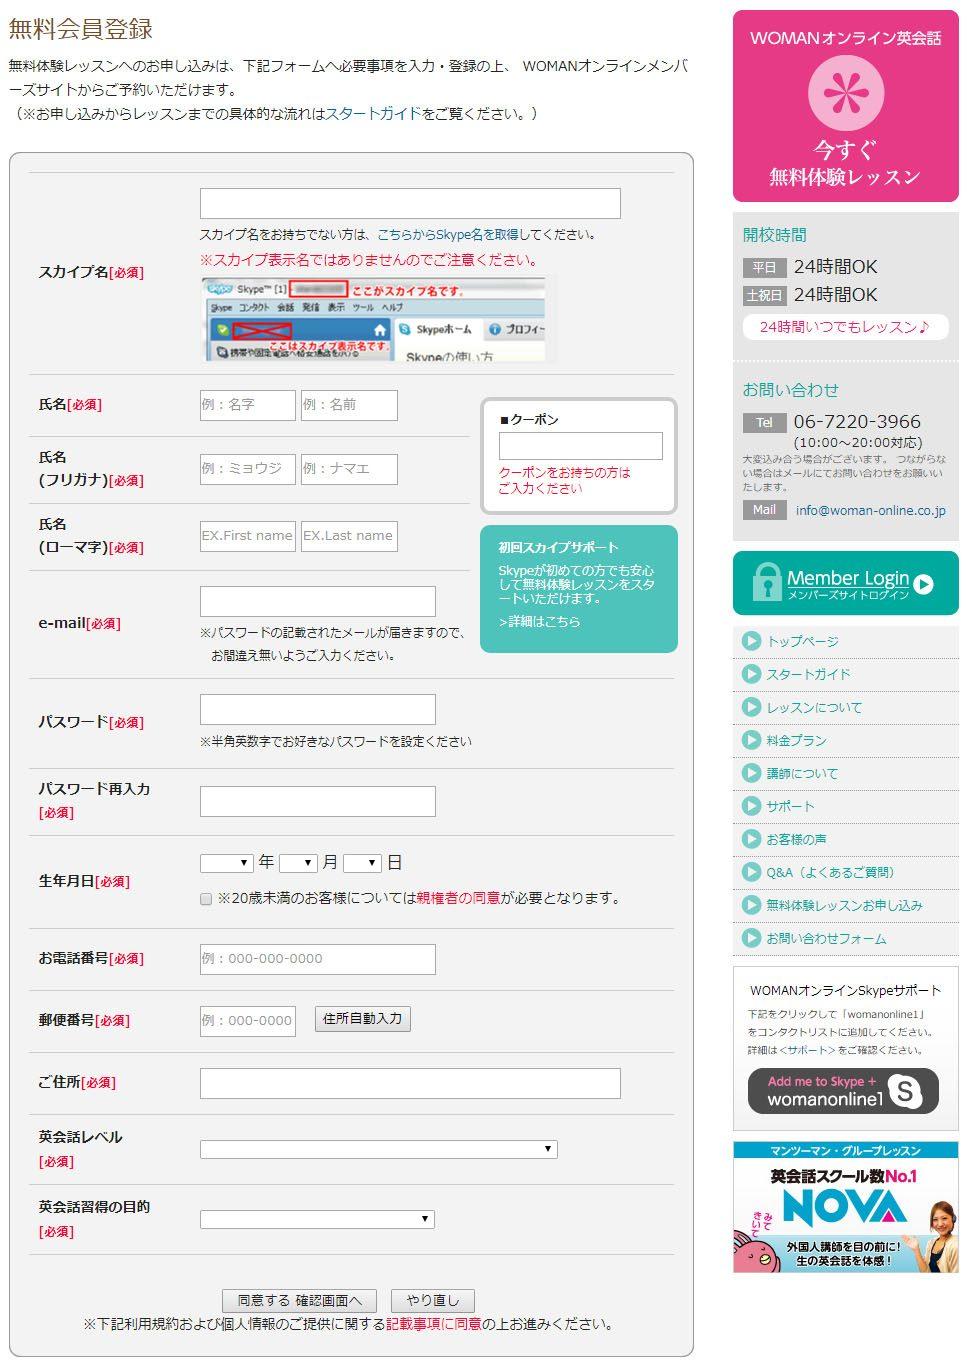 WOMANオンラインの無料体験レッスン申し込みの必要事項記入の画面